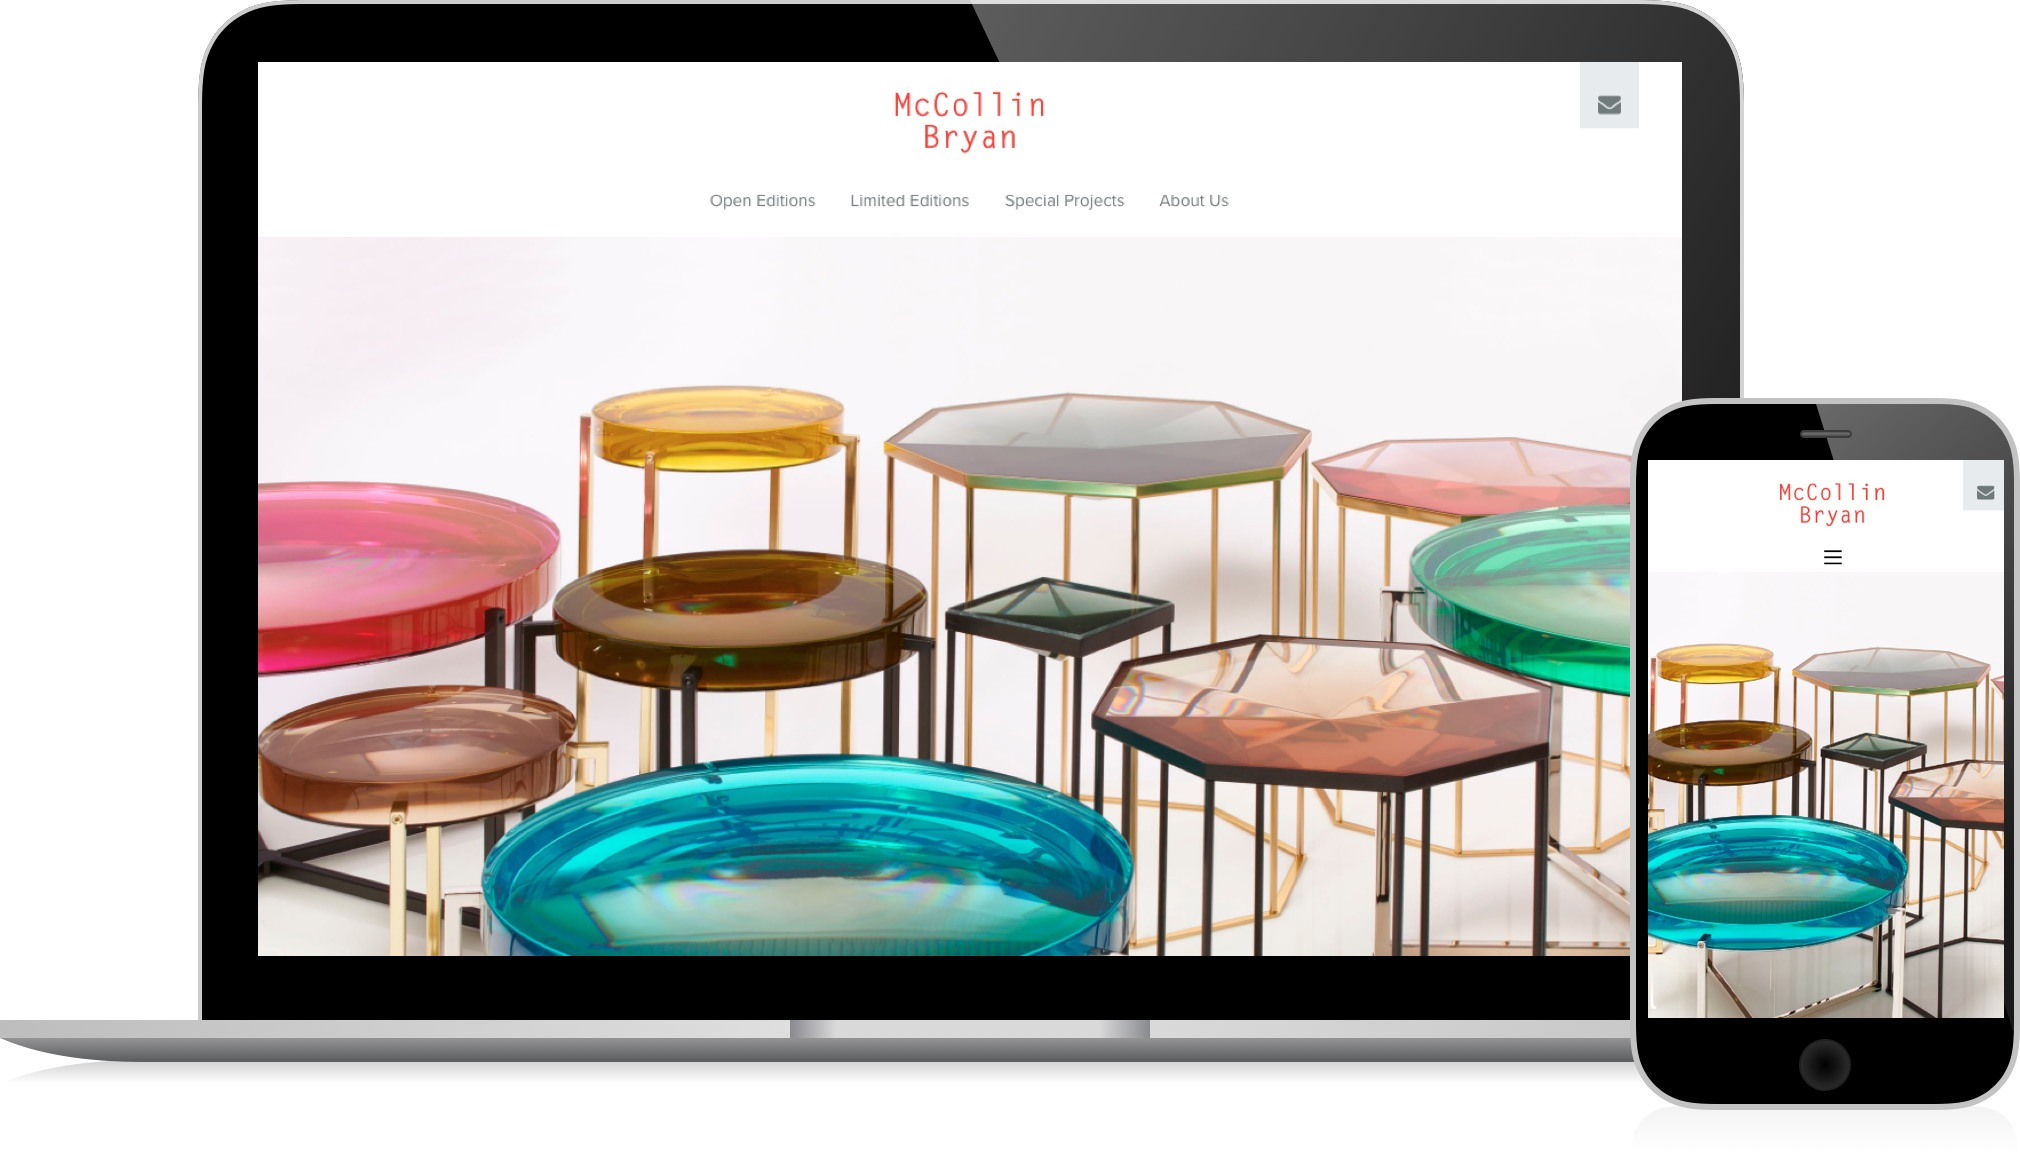 McCollin Bryan - responsive web design and Wordpress development by HeavyGuru, London